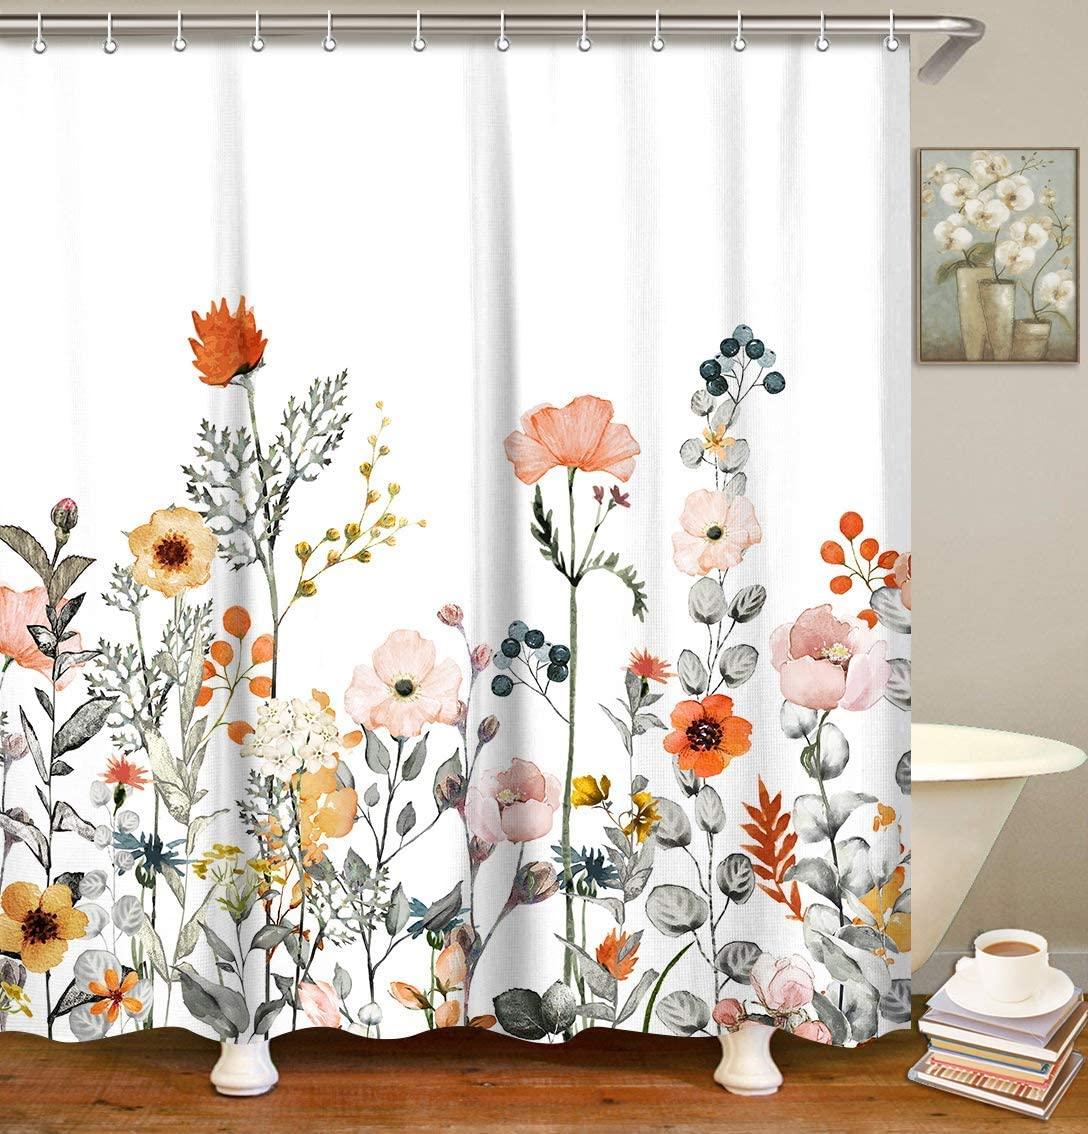 LIVILAN Fabric Floral Shower Curtain Set